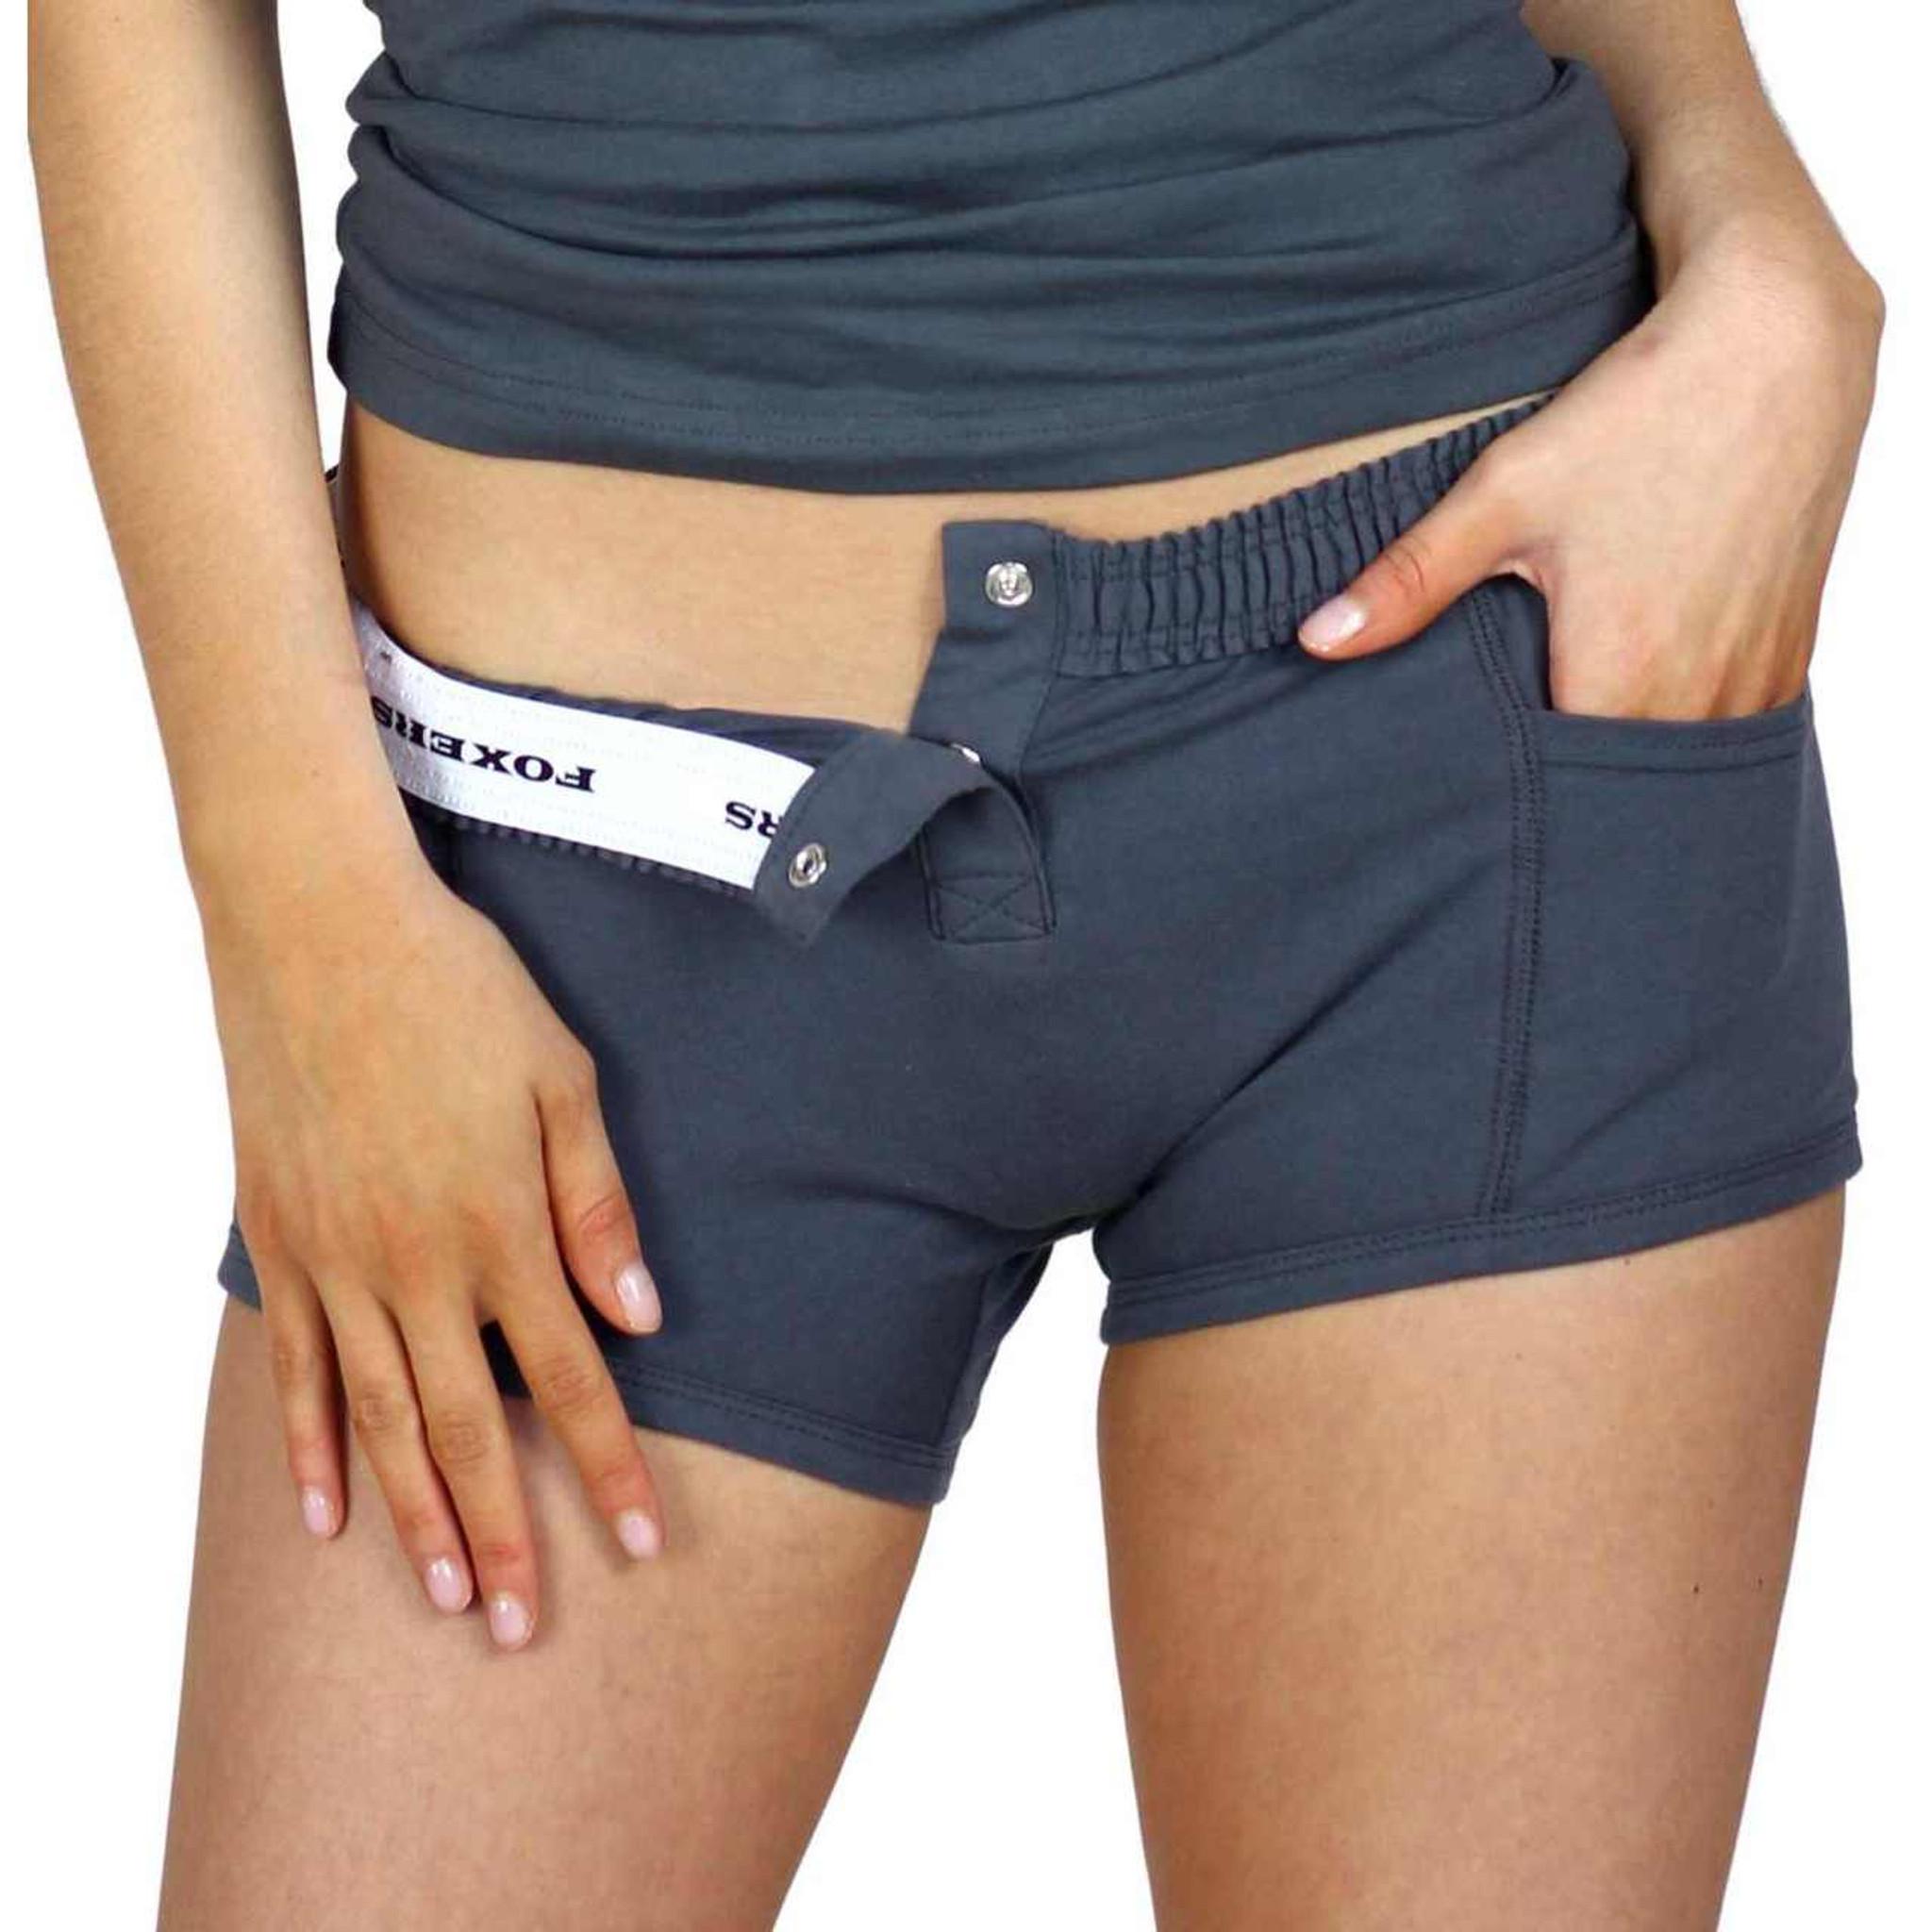 20fa868a2e4b Tomboy Underwear | Charcoal Charcoal Gray Tomboy Boxer Briefs Women's  Underwear ...